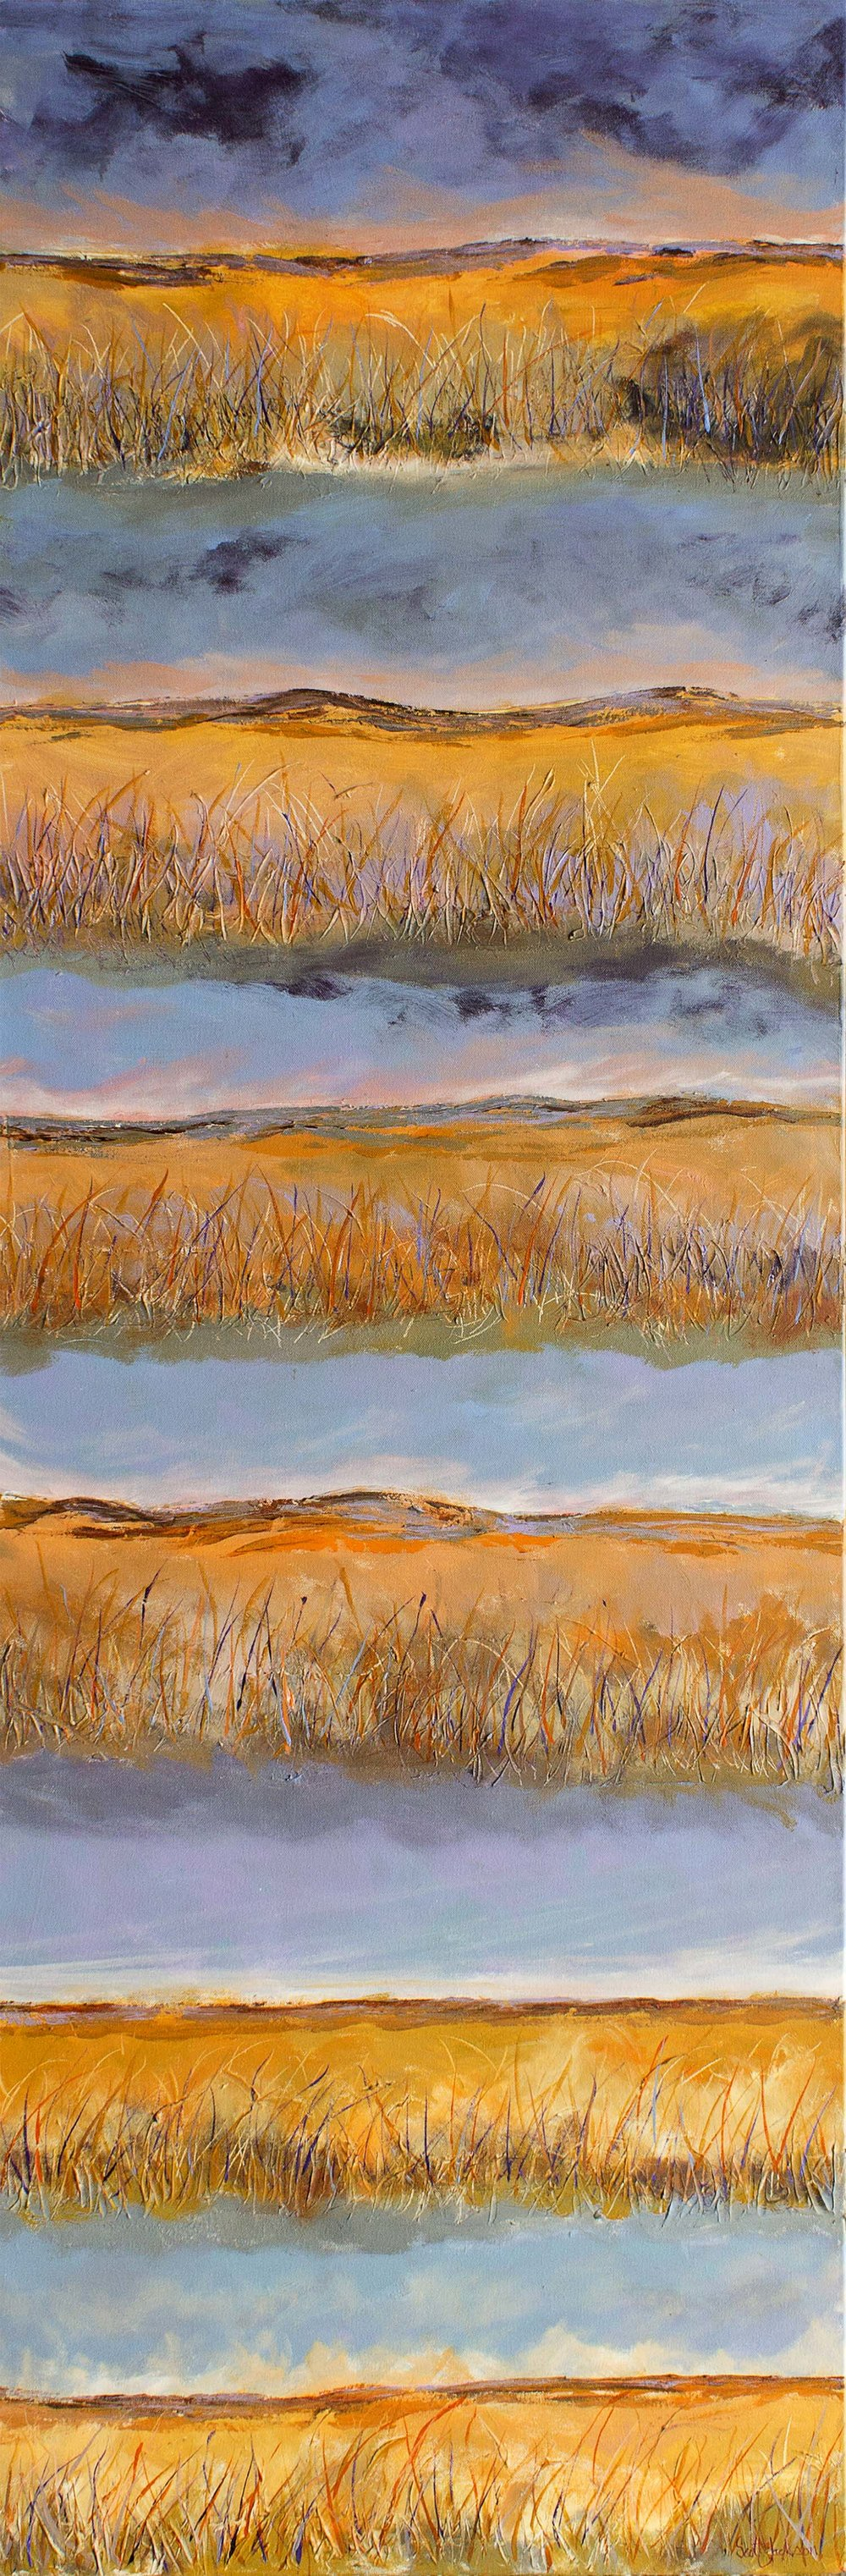 Grassland Horizons